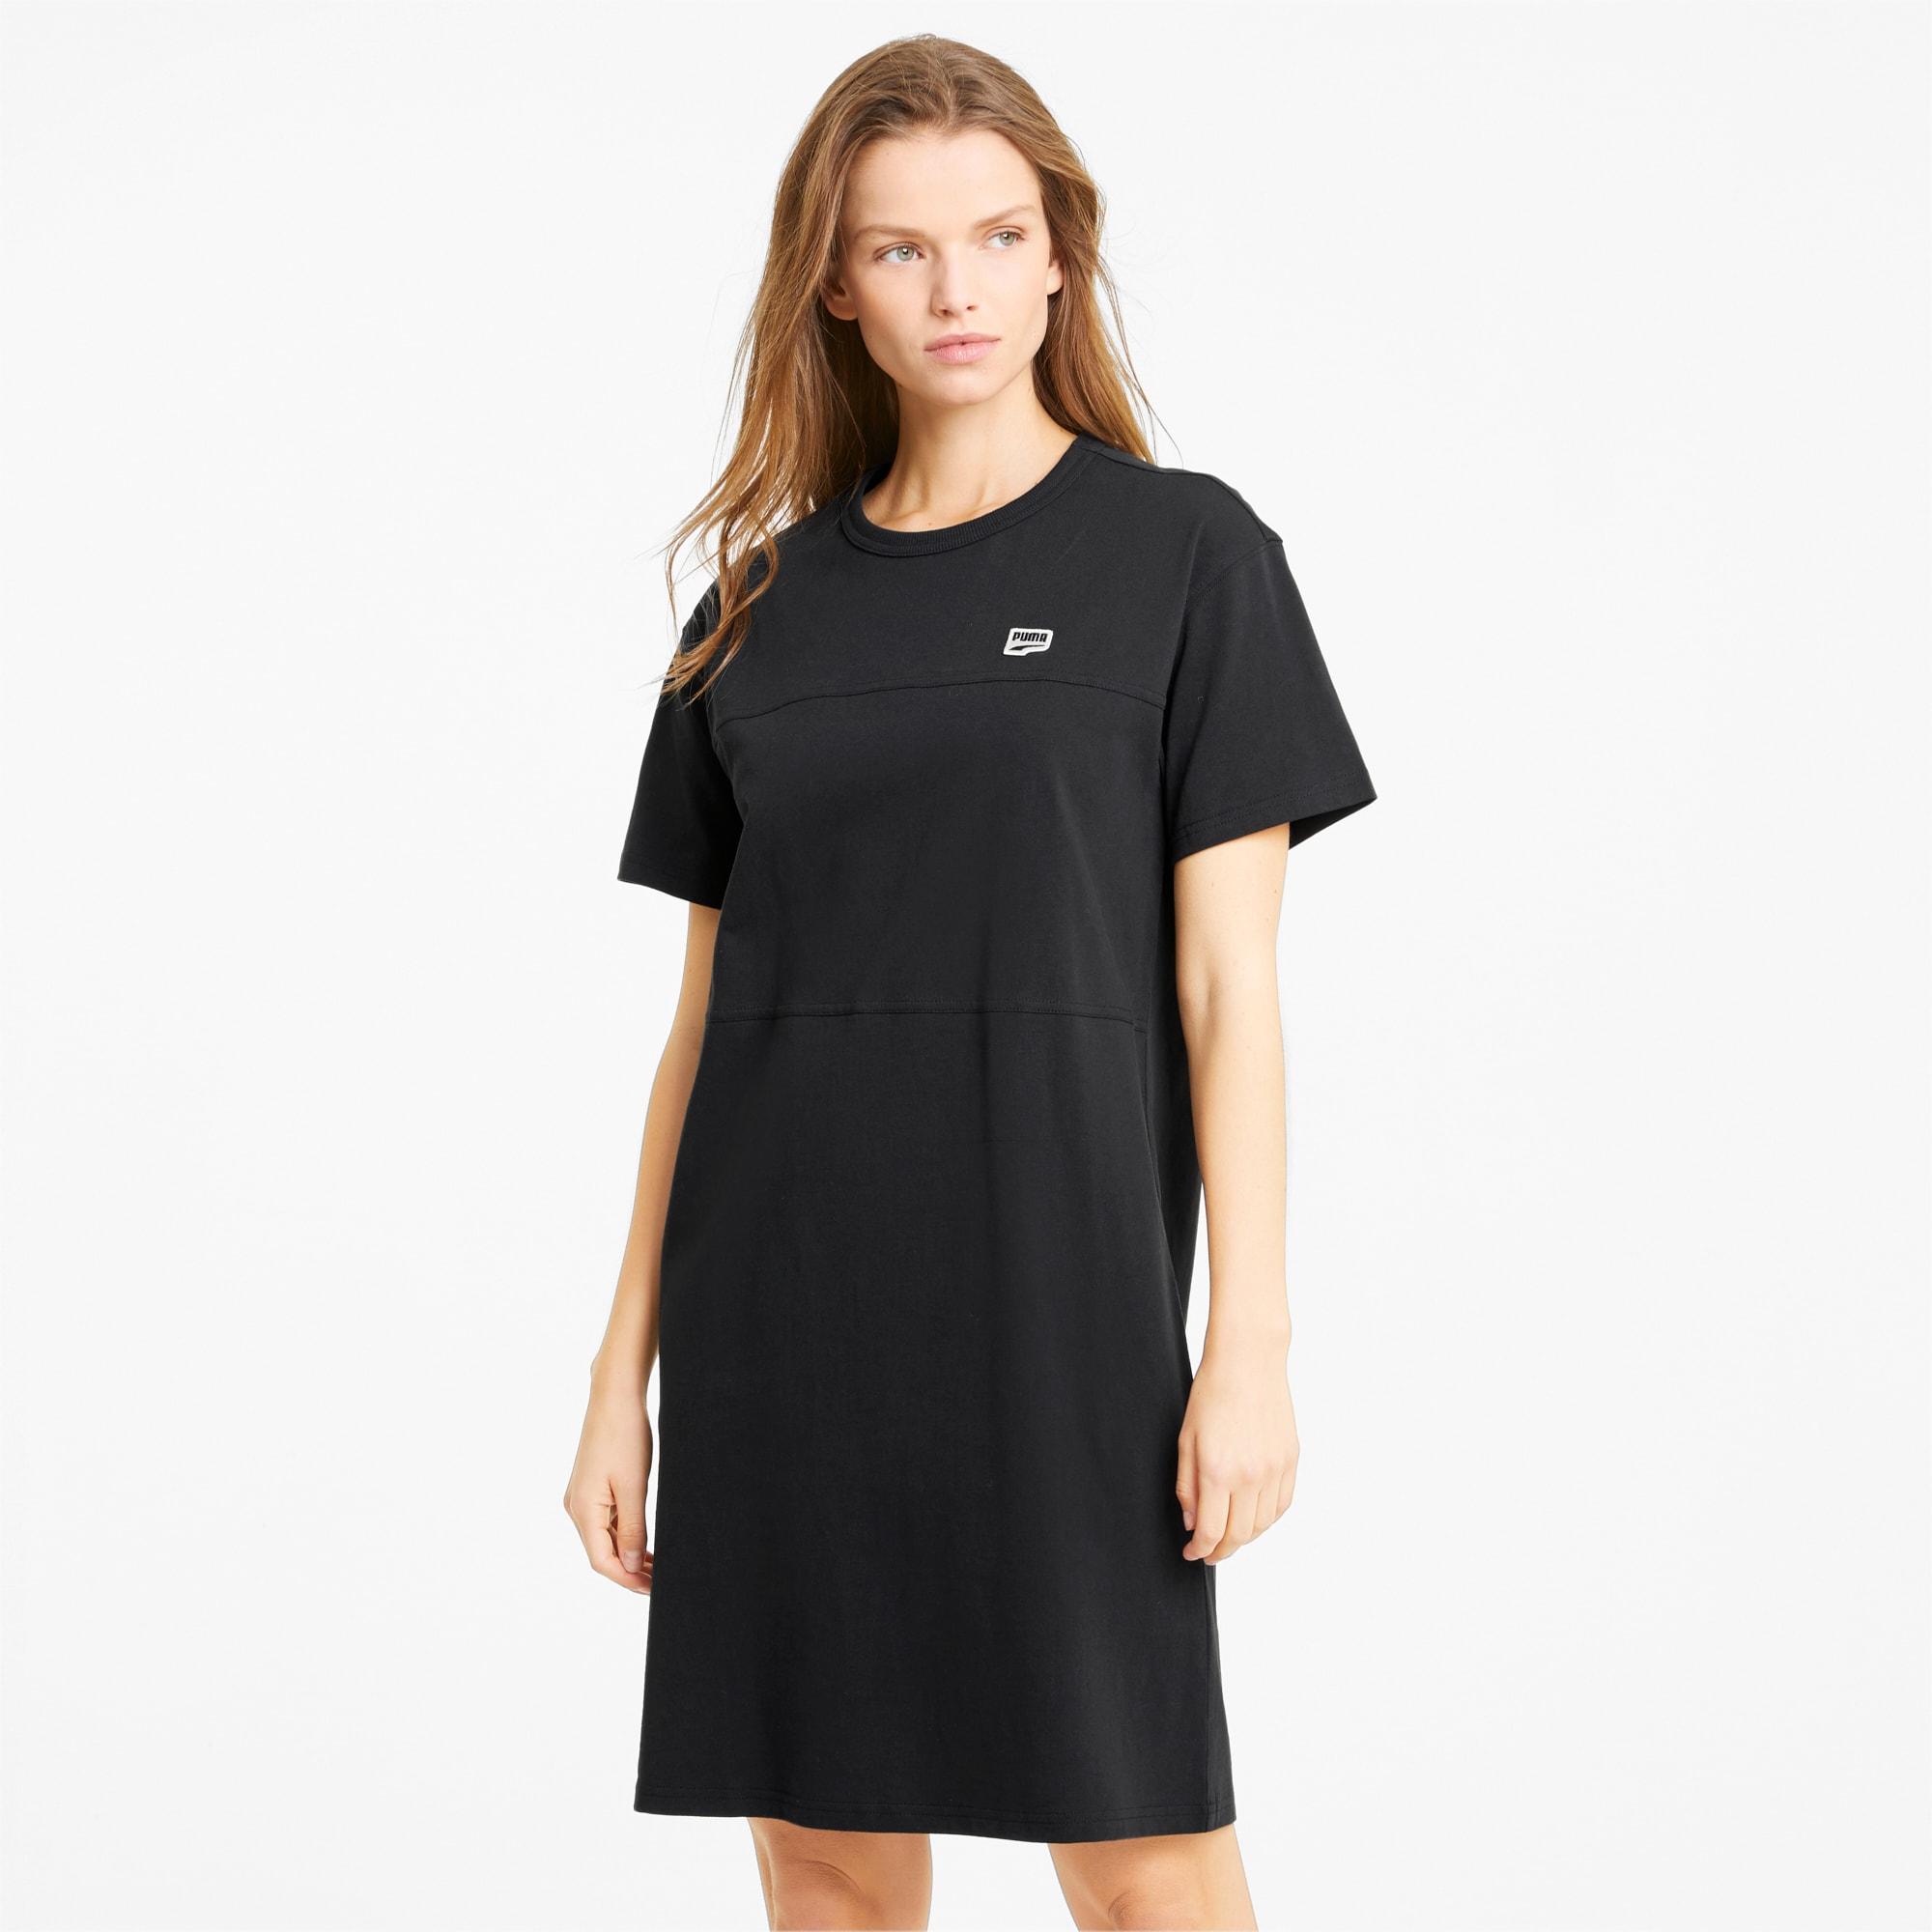 PUMA Downtown Women's Tee Dress, Black, size Medium, Clothing